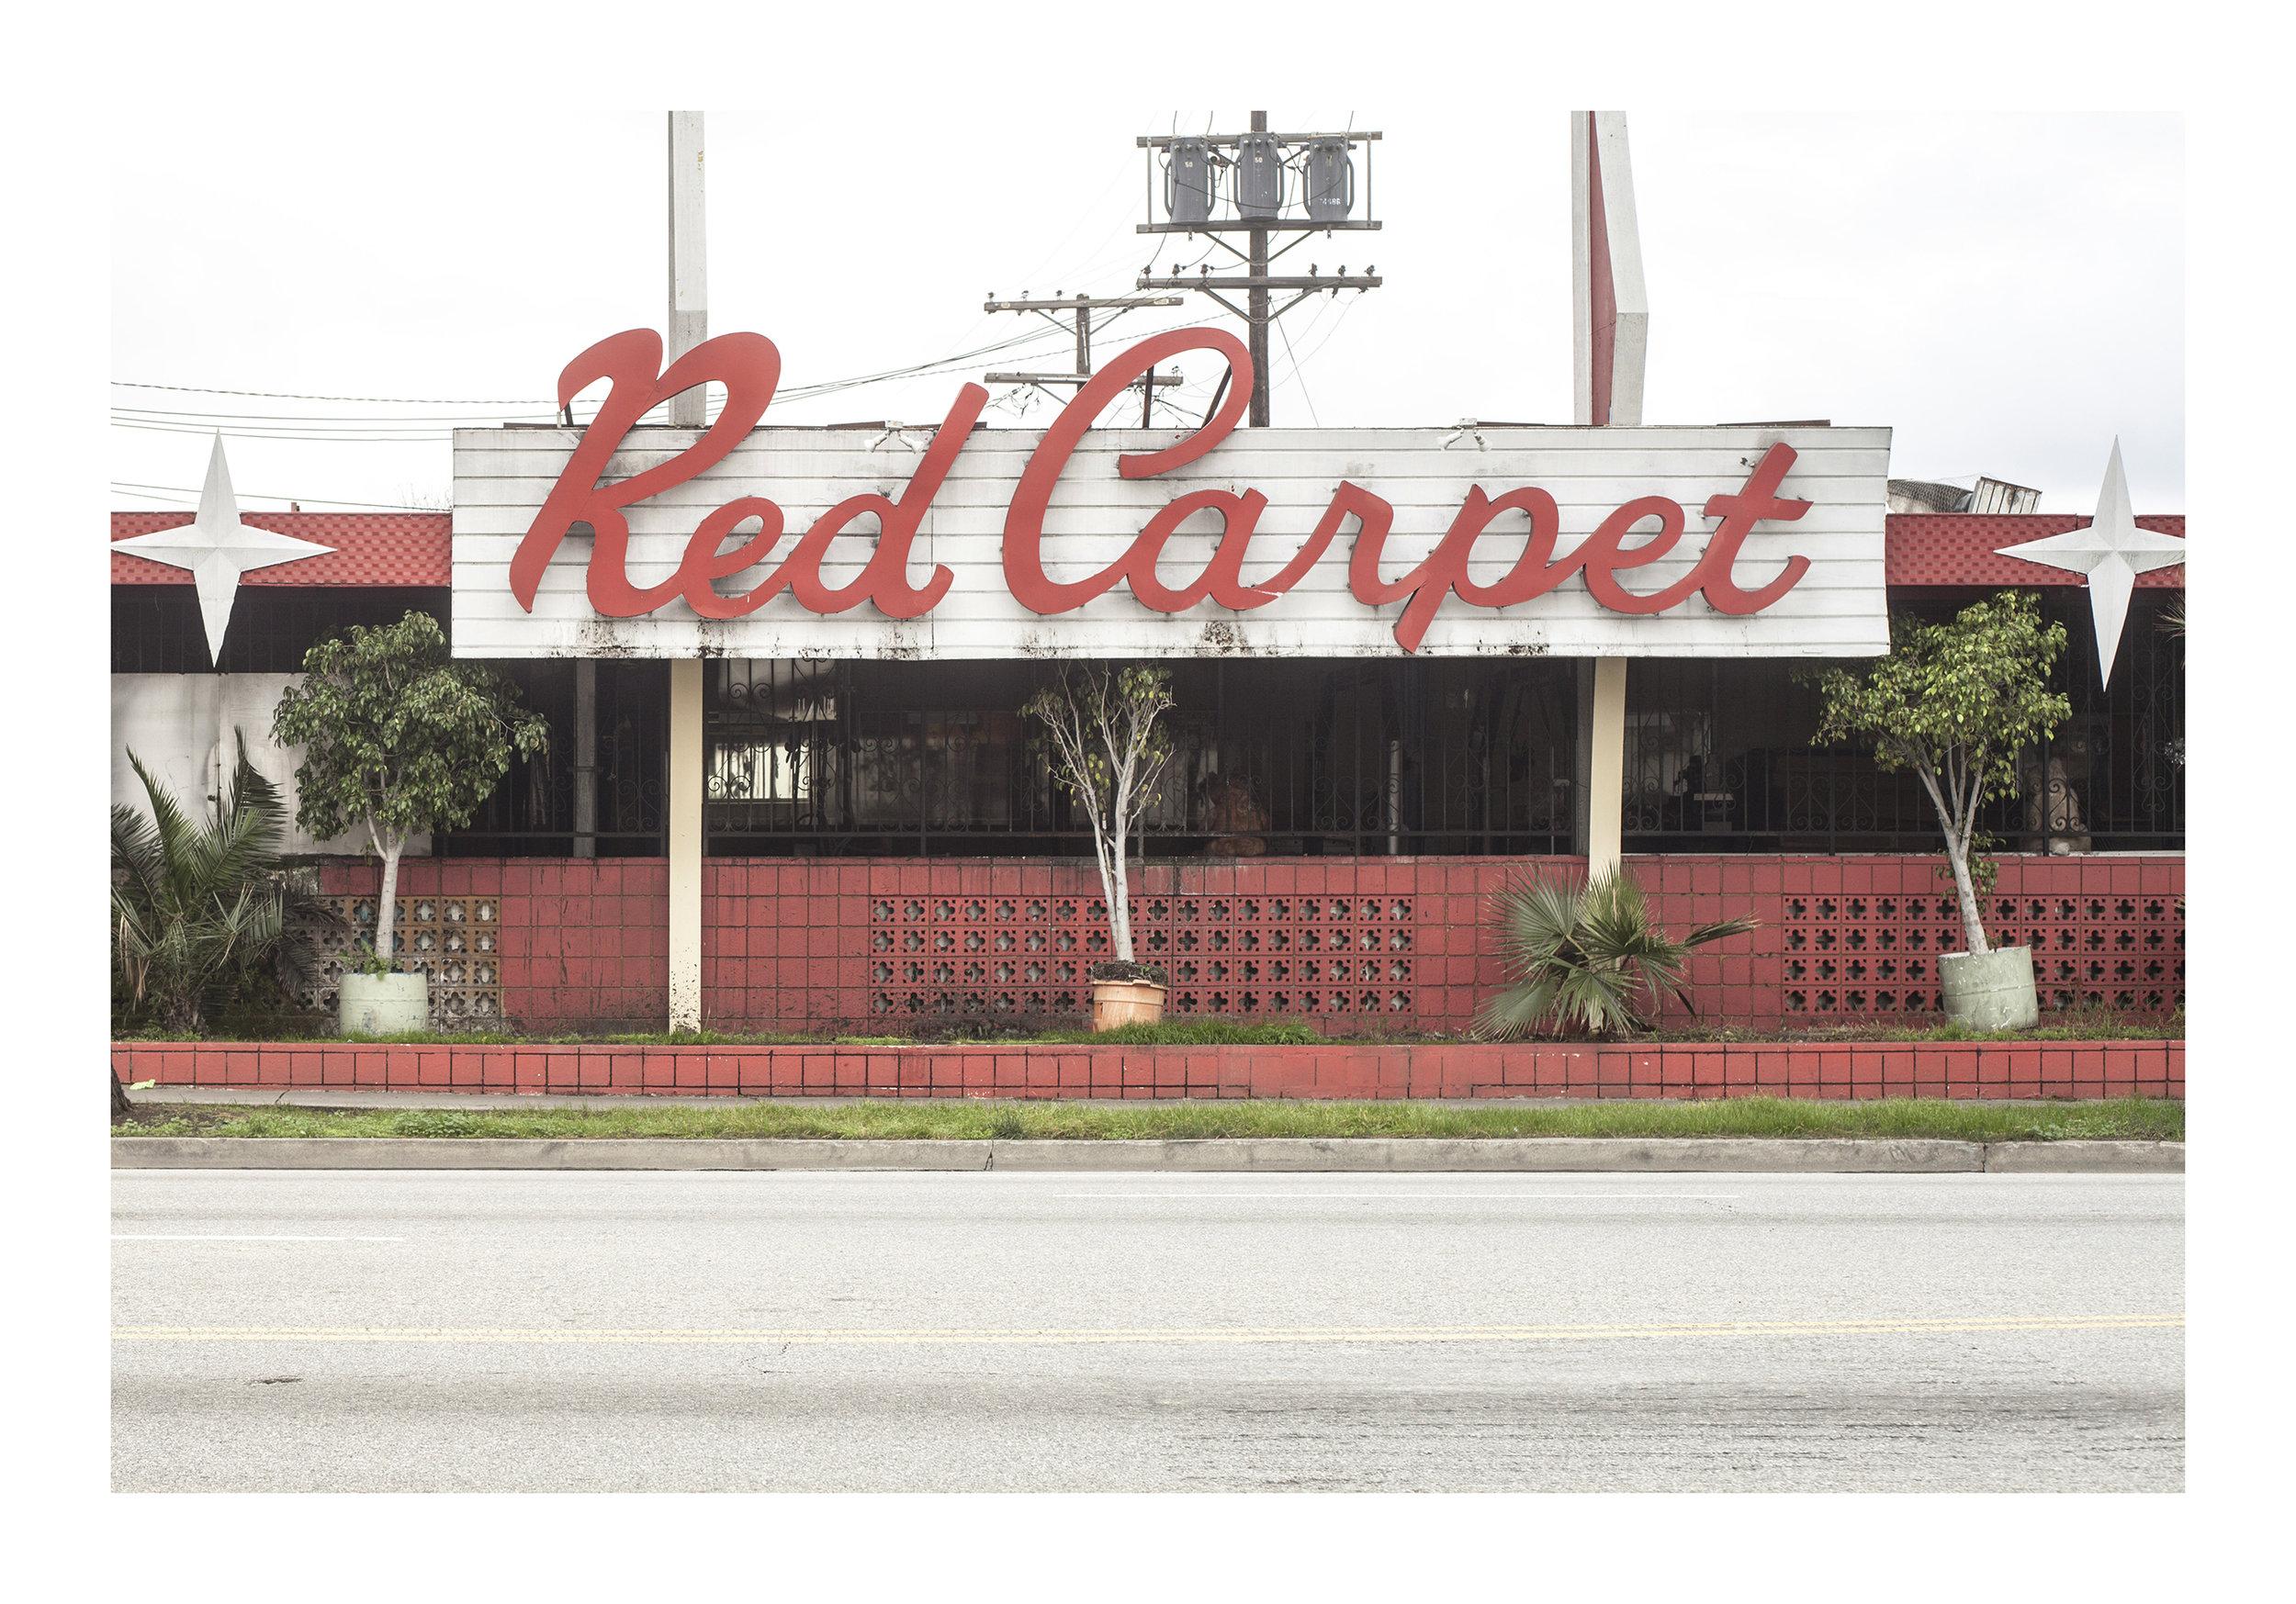 Red Carpet Car Wash Los Angeles, California 2016